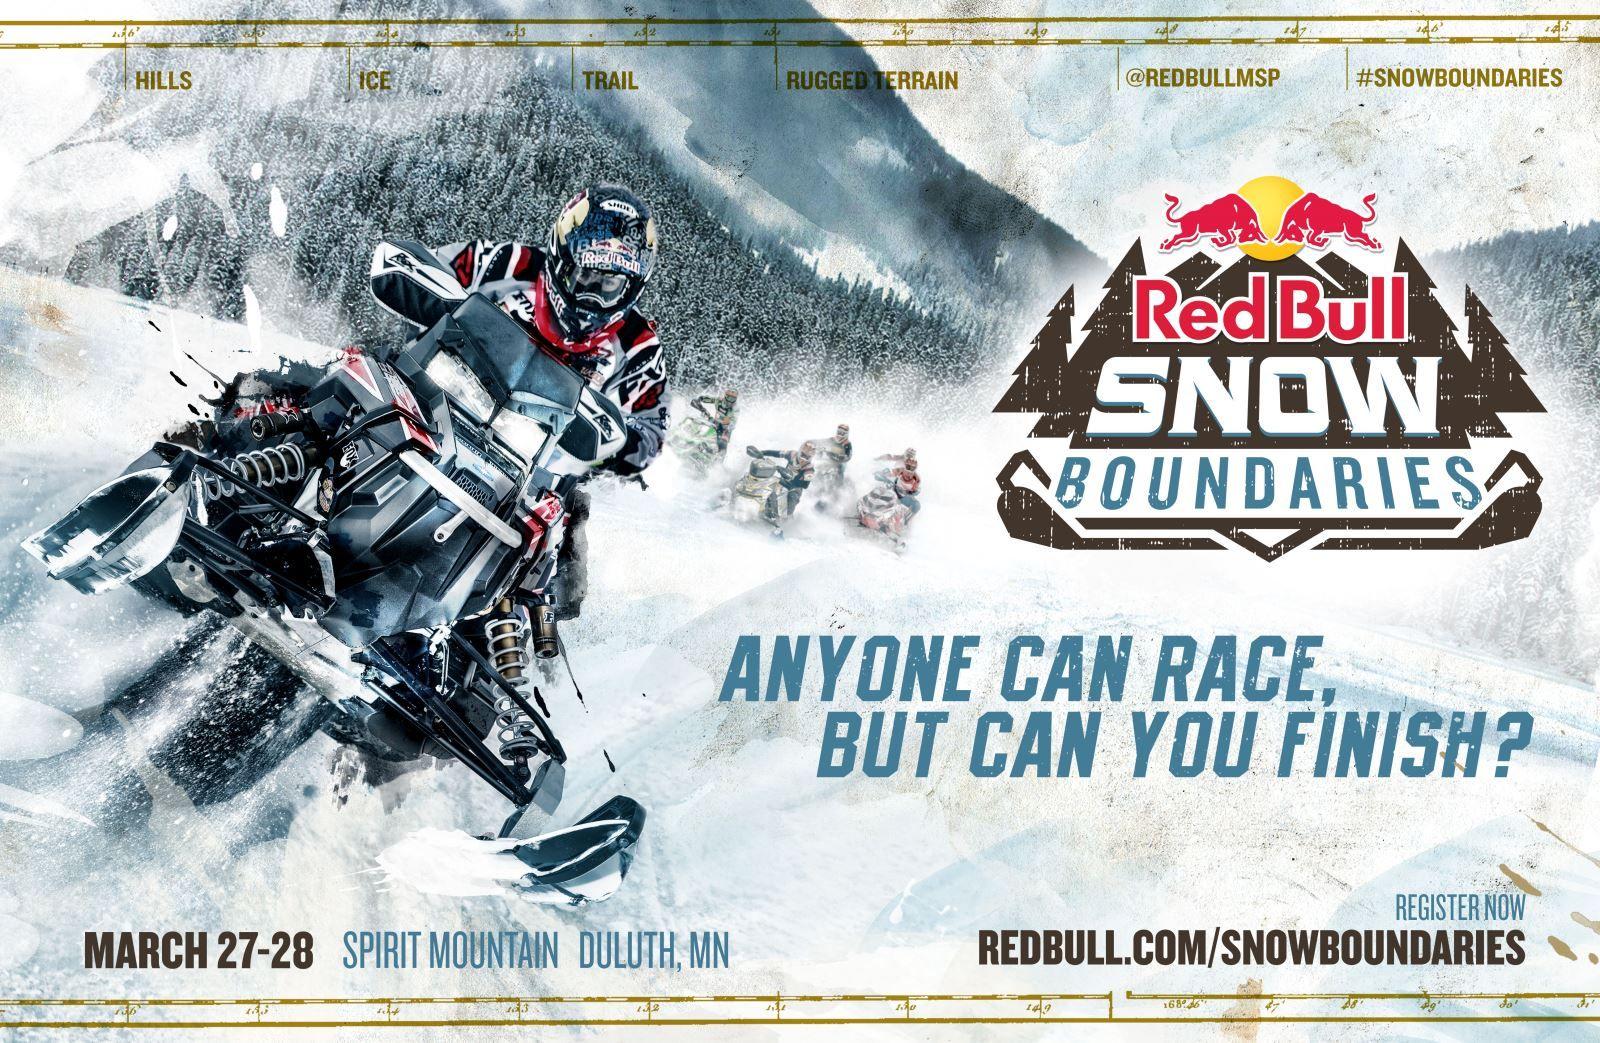 Red Bull Snow Boundaries To Bring Endurance Snowmobile Racing To Spirit Mountain Ski Resort Multi Discipline Endurance Race To Featu Snocross Racing Hill Climb